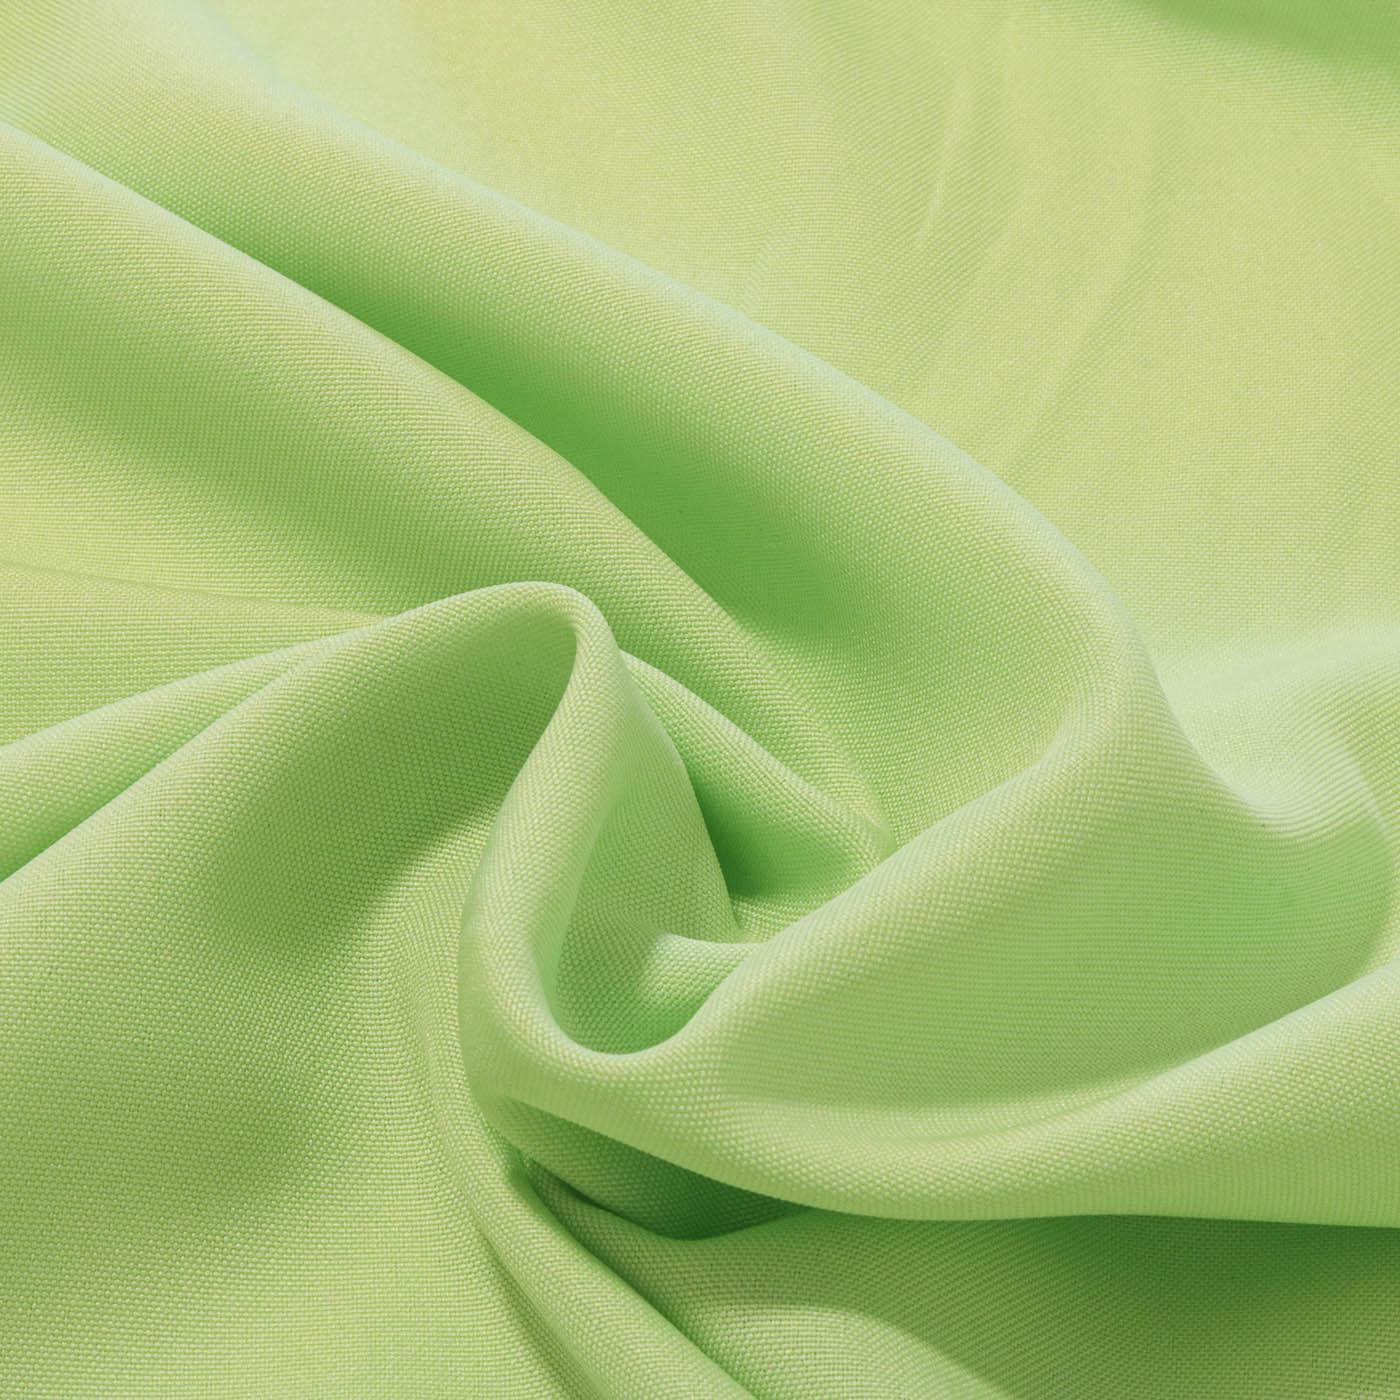 Tecido Oxford Liso 100% Poliester 1,50 m Largura Verde Claro